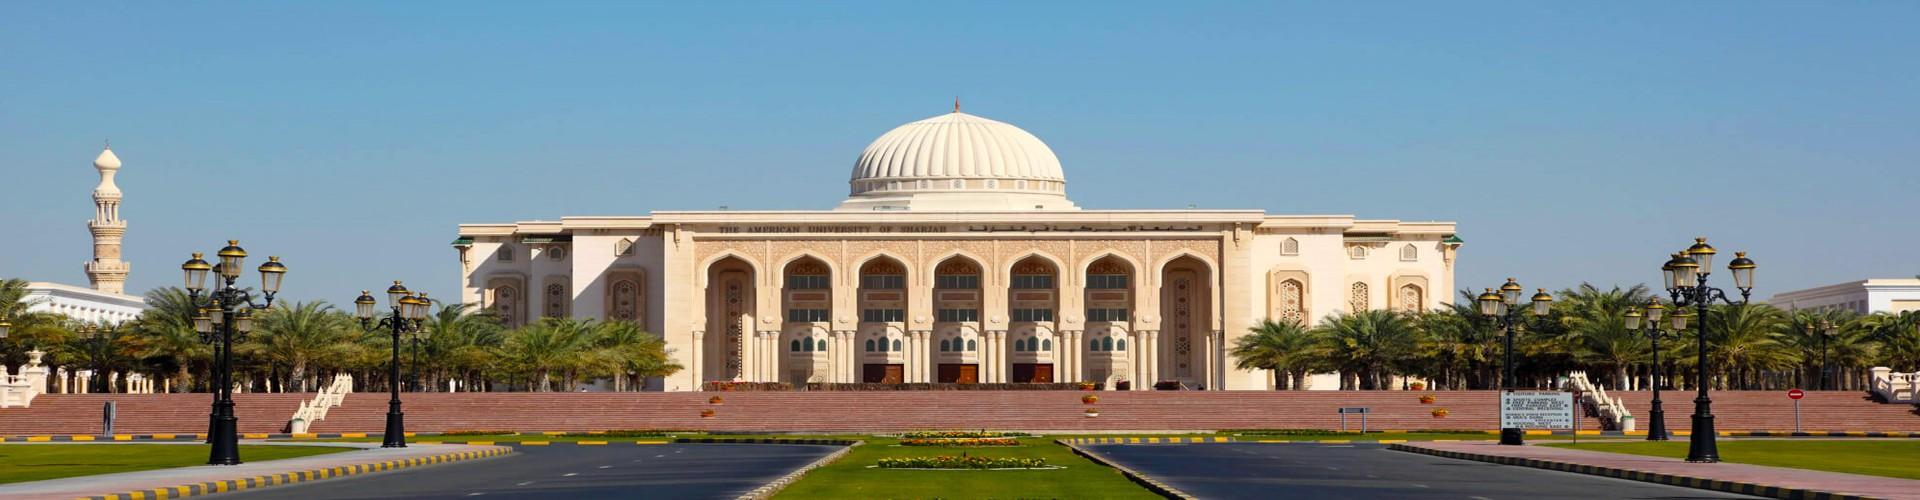 University of sharjah khurfaqan